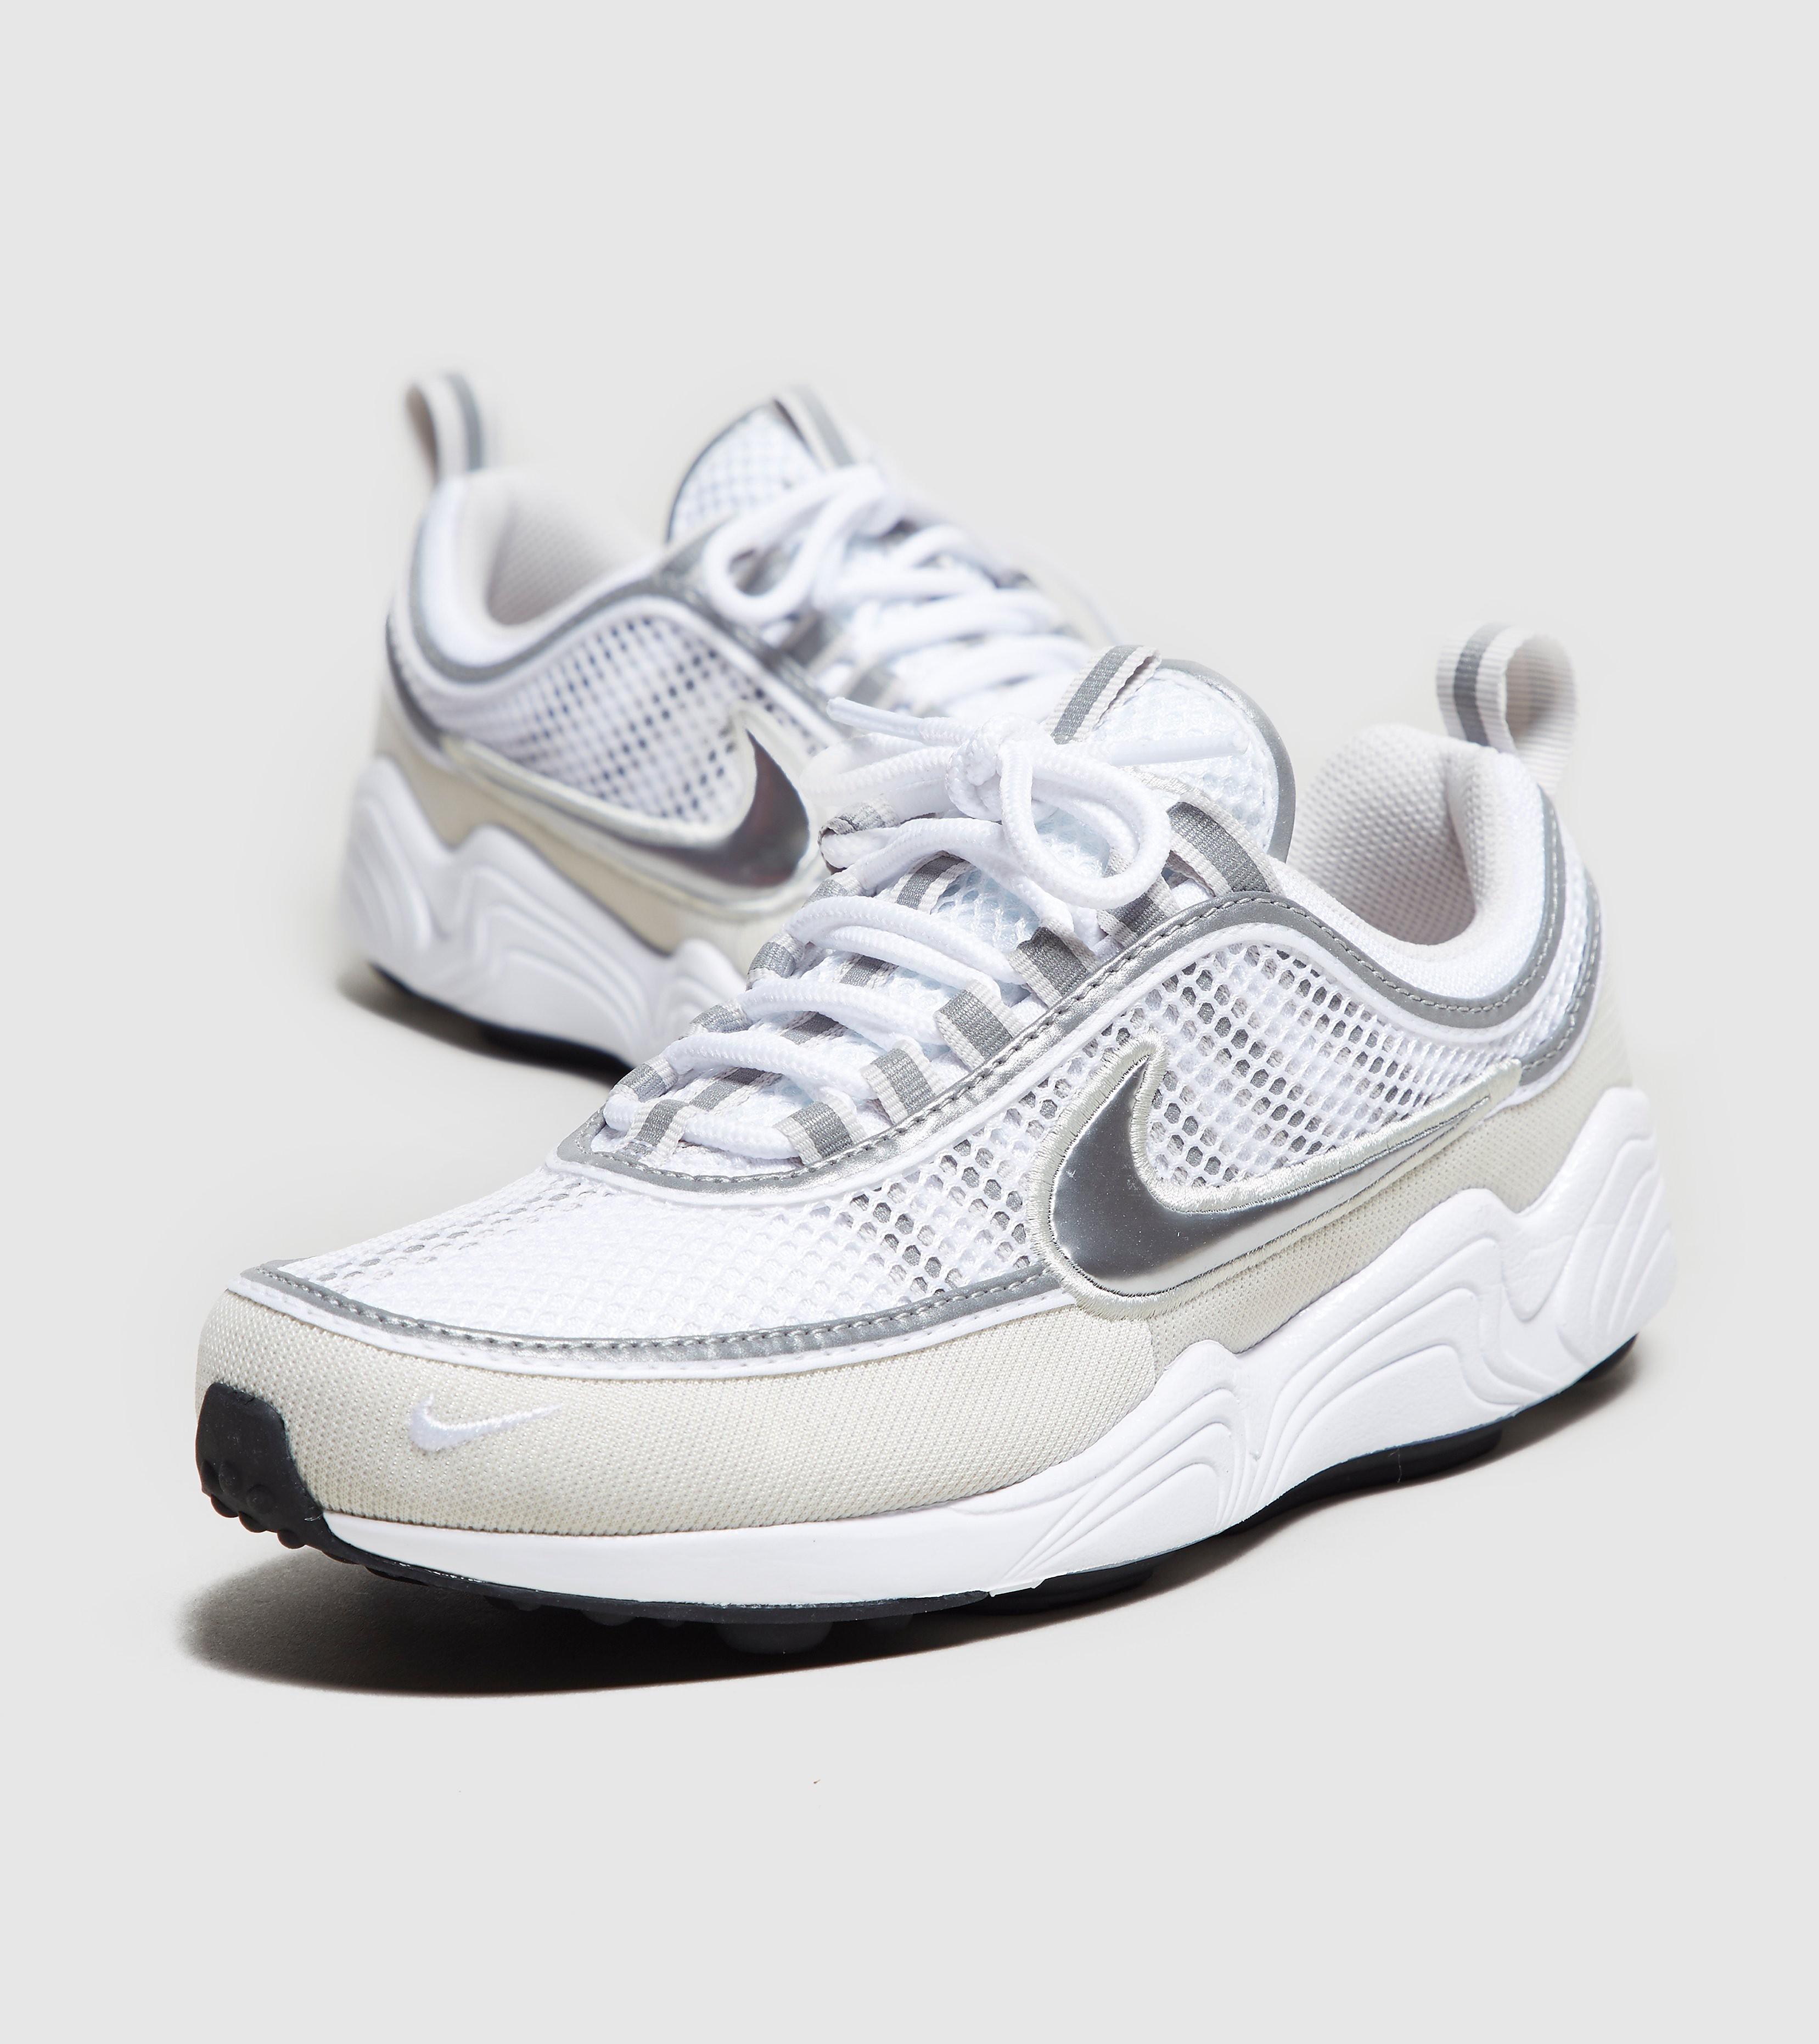 Nike Zoom Spiridon Femme